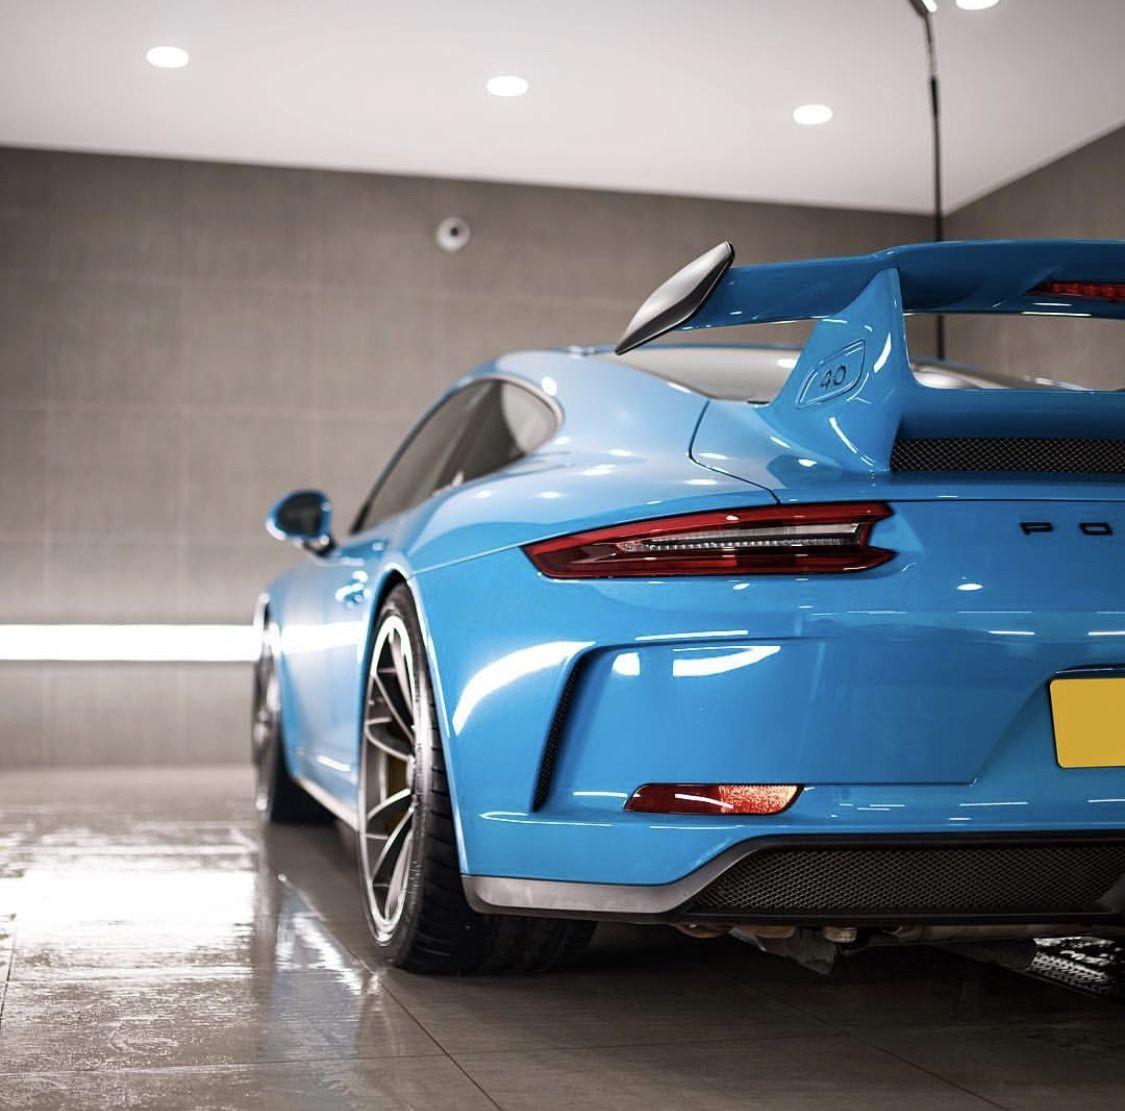 Most Expensive Porsche Car: Super Cars, Porsche Gt, Porsche Cars